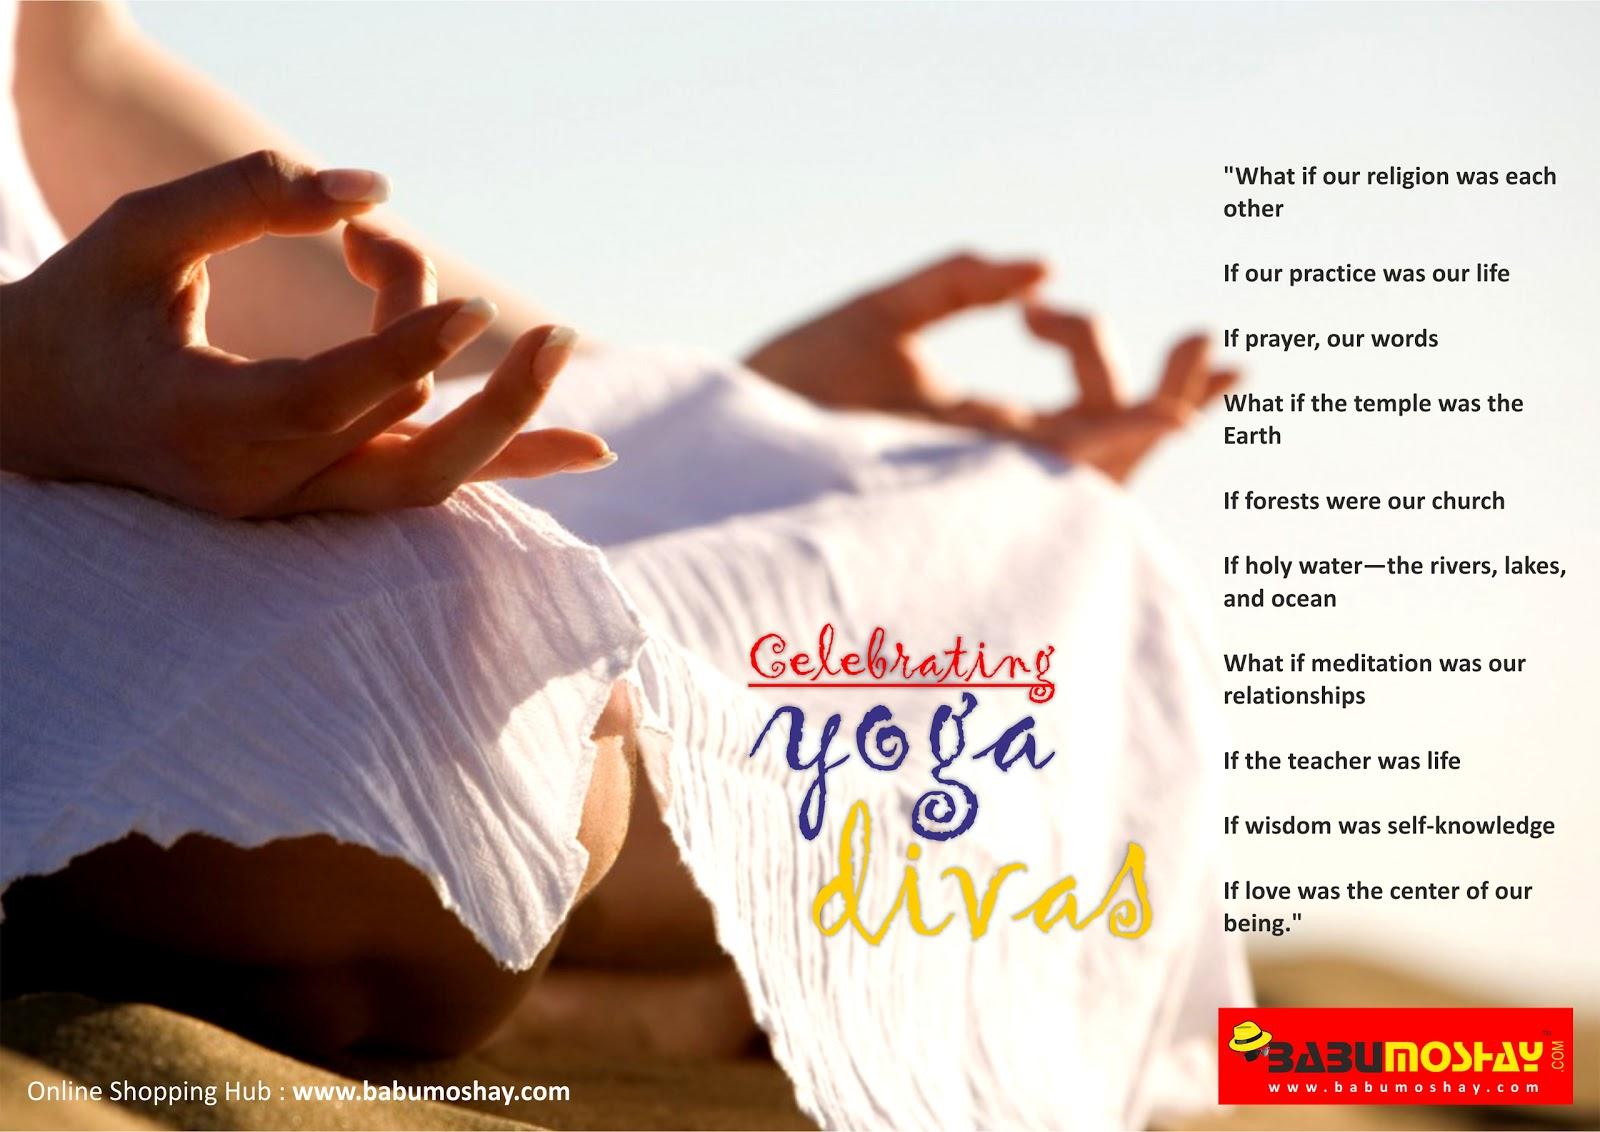 Babumoshay Blog Information for Online Shopping Celebrating YOGA